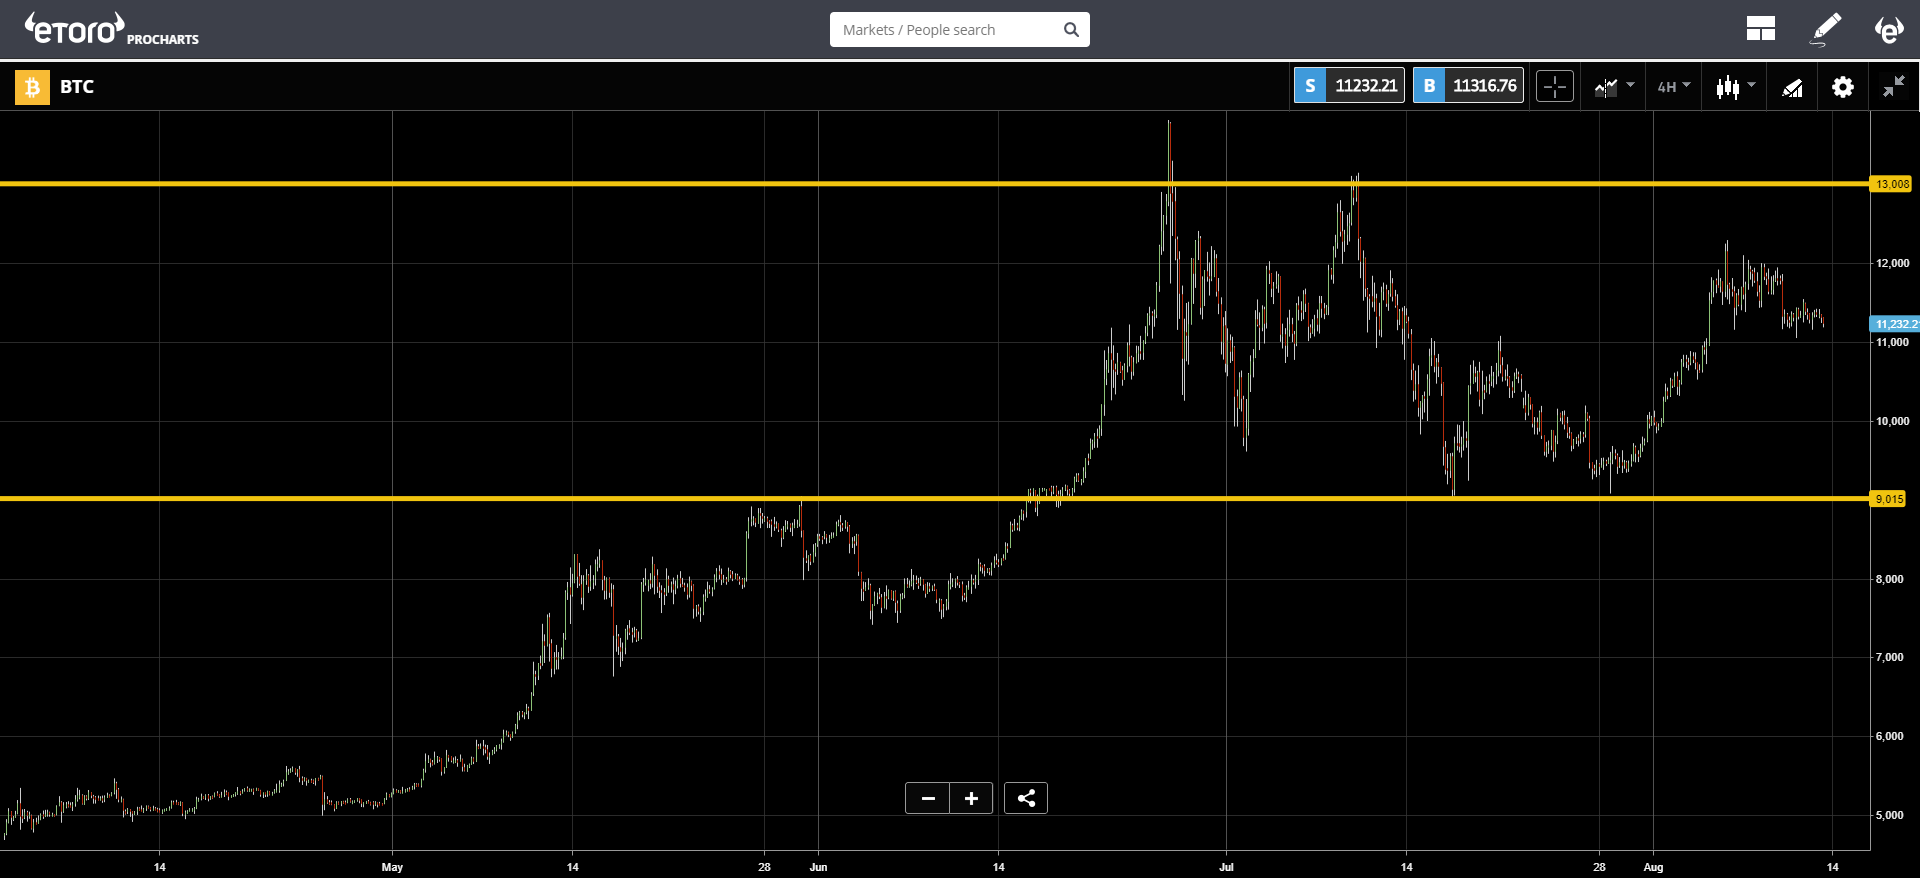 market, cryptocurrency, bitcoin, blockchain, ethereum, investors